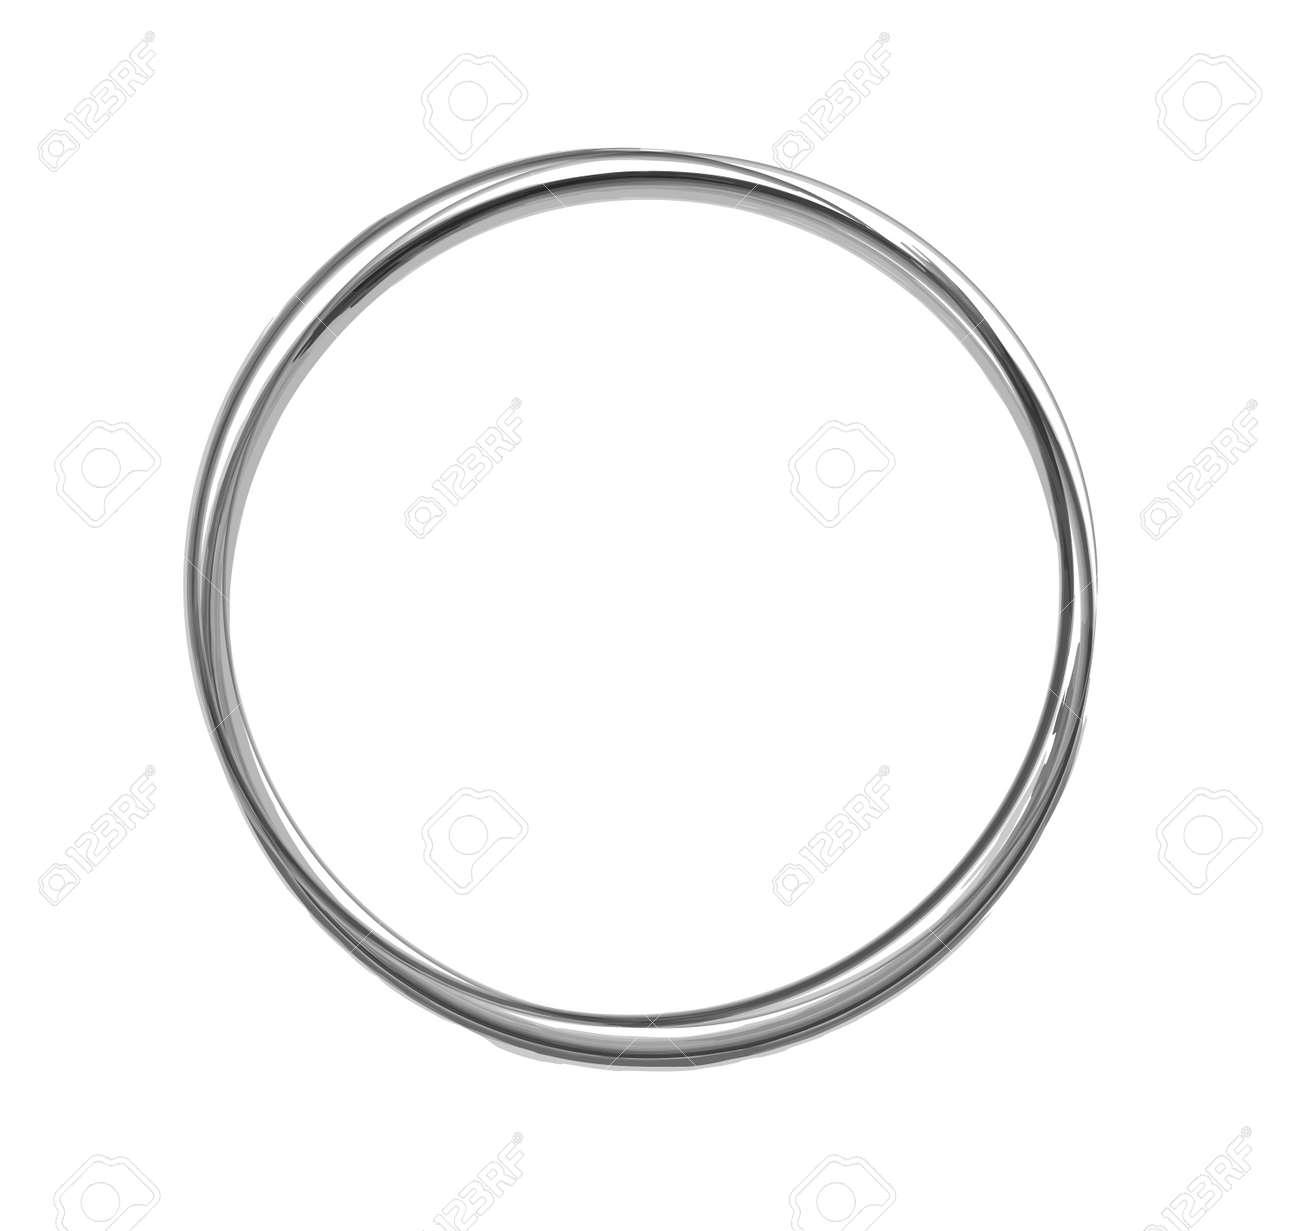 Brush round frame on white background - 150368755